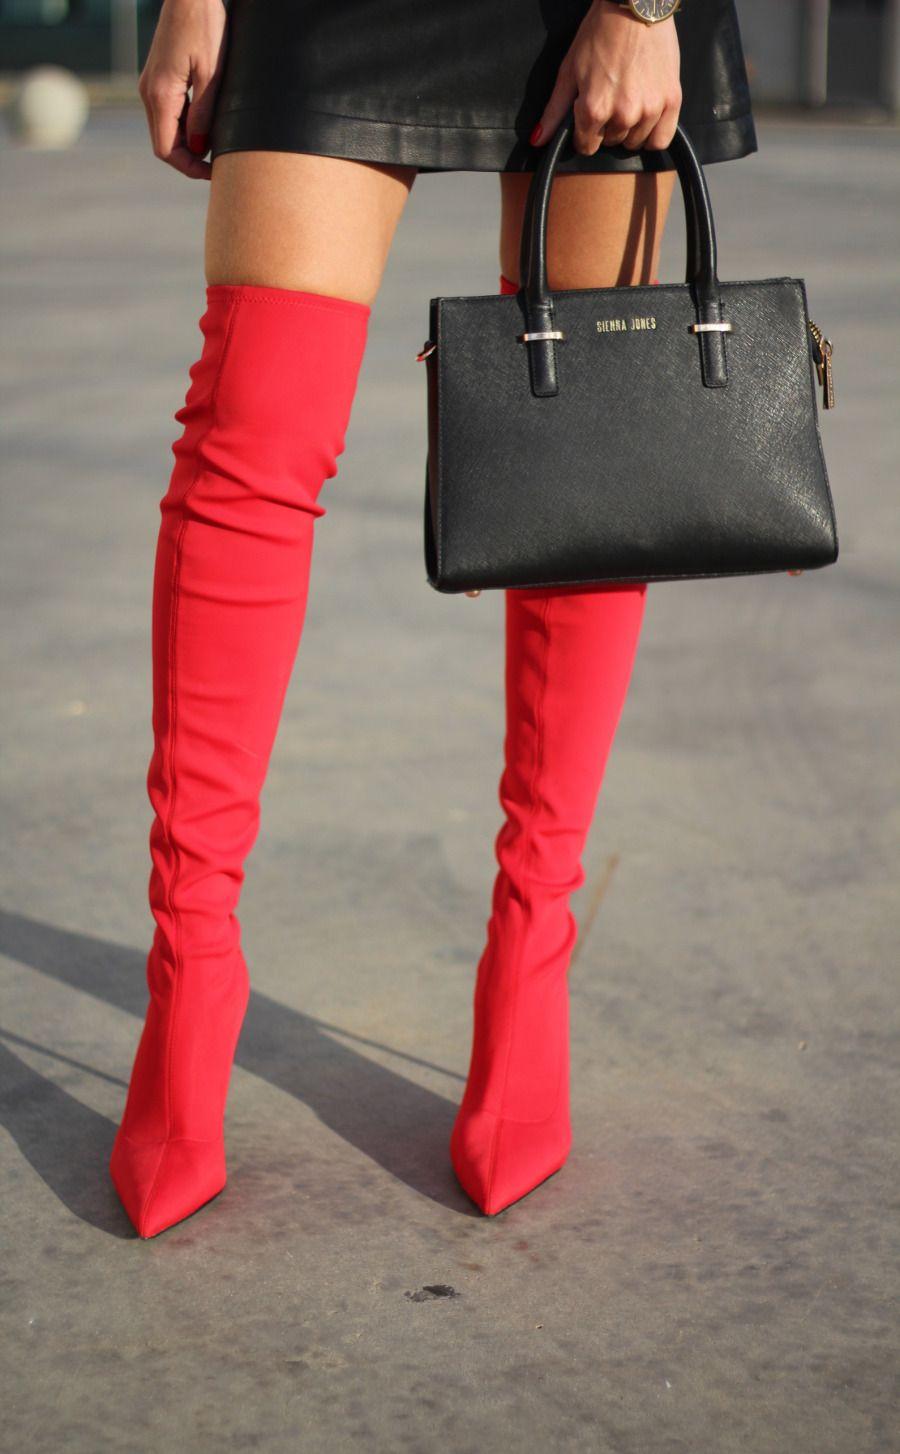 a8ea2ebb385 Botas rojas altas mango bolso mano negro